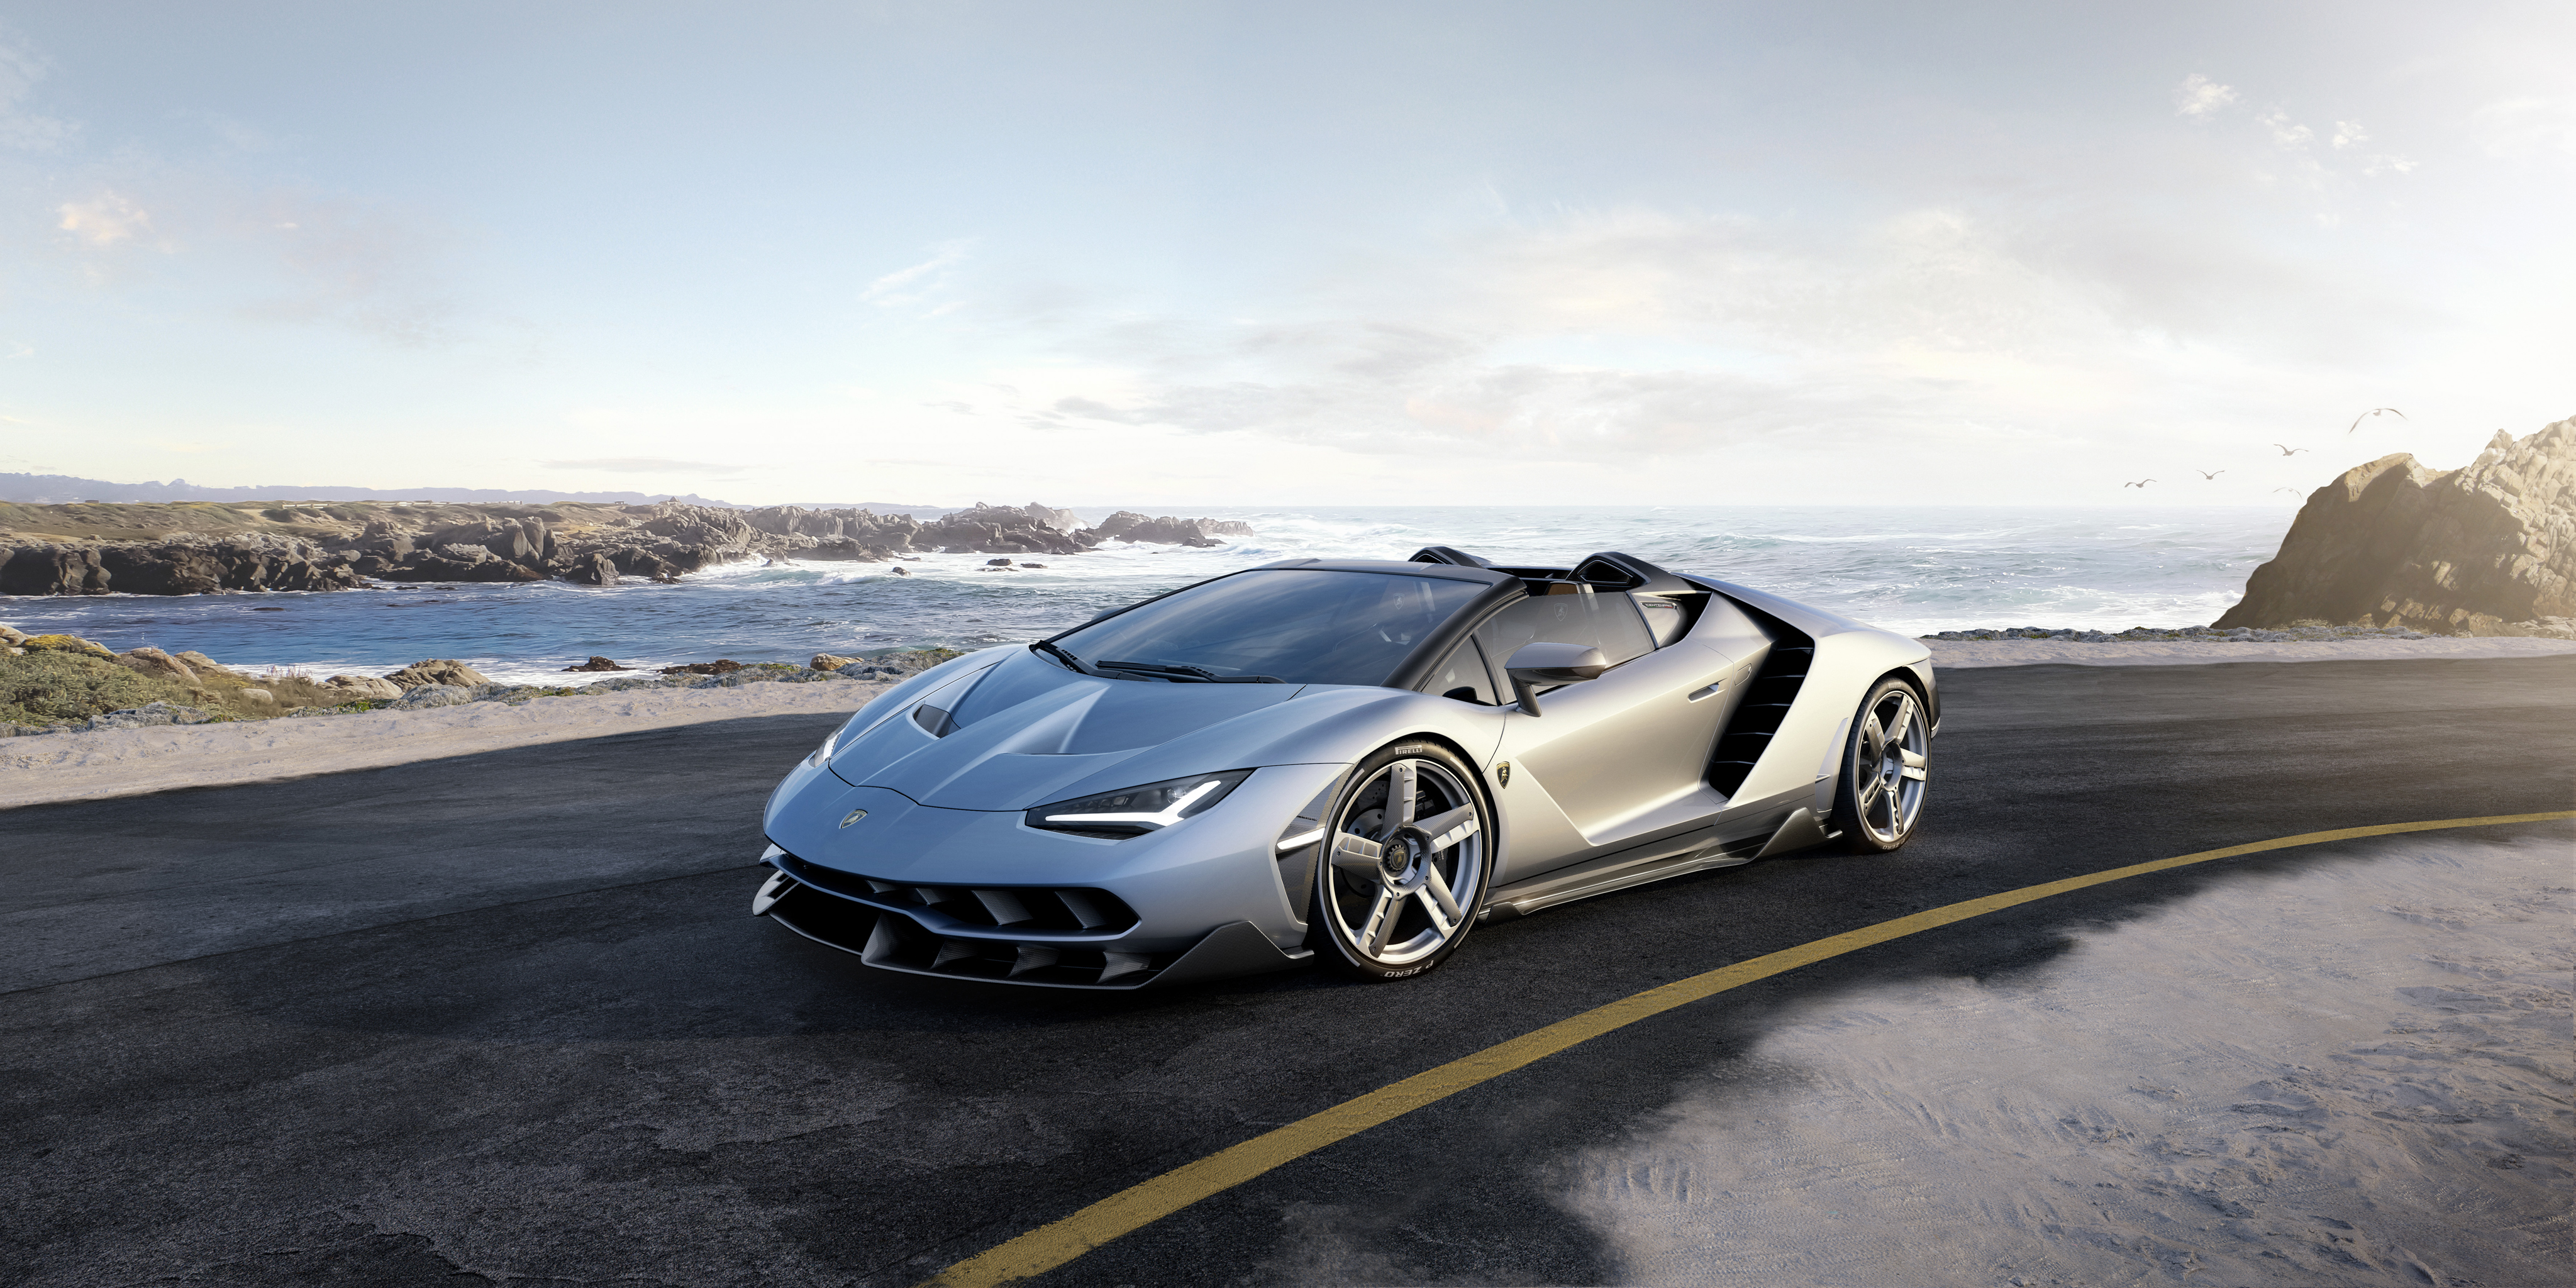 2017 Lamborghini Centenario 4k Wallpaper